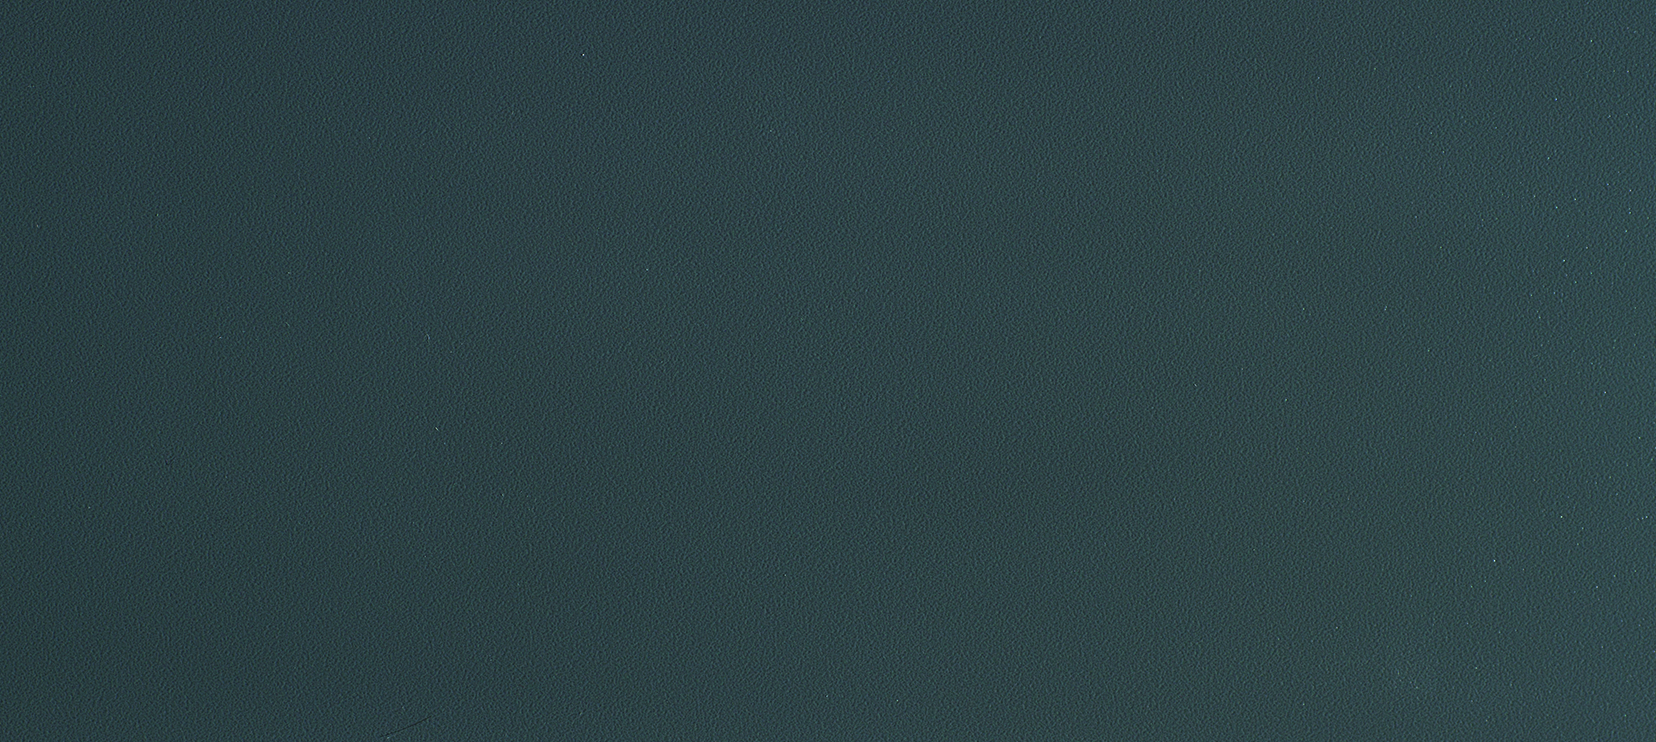 RAL 7012 - Basaltgrau glatt - Art. 43670